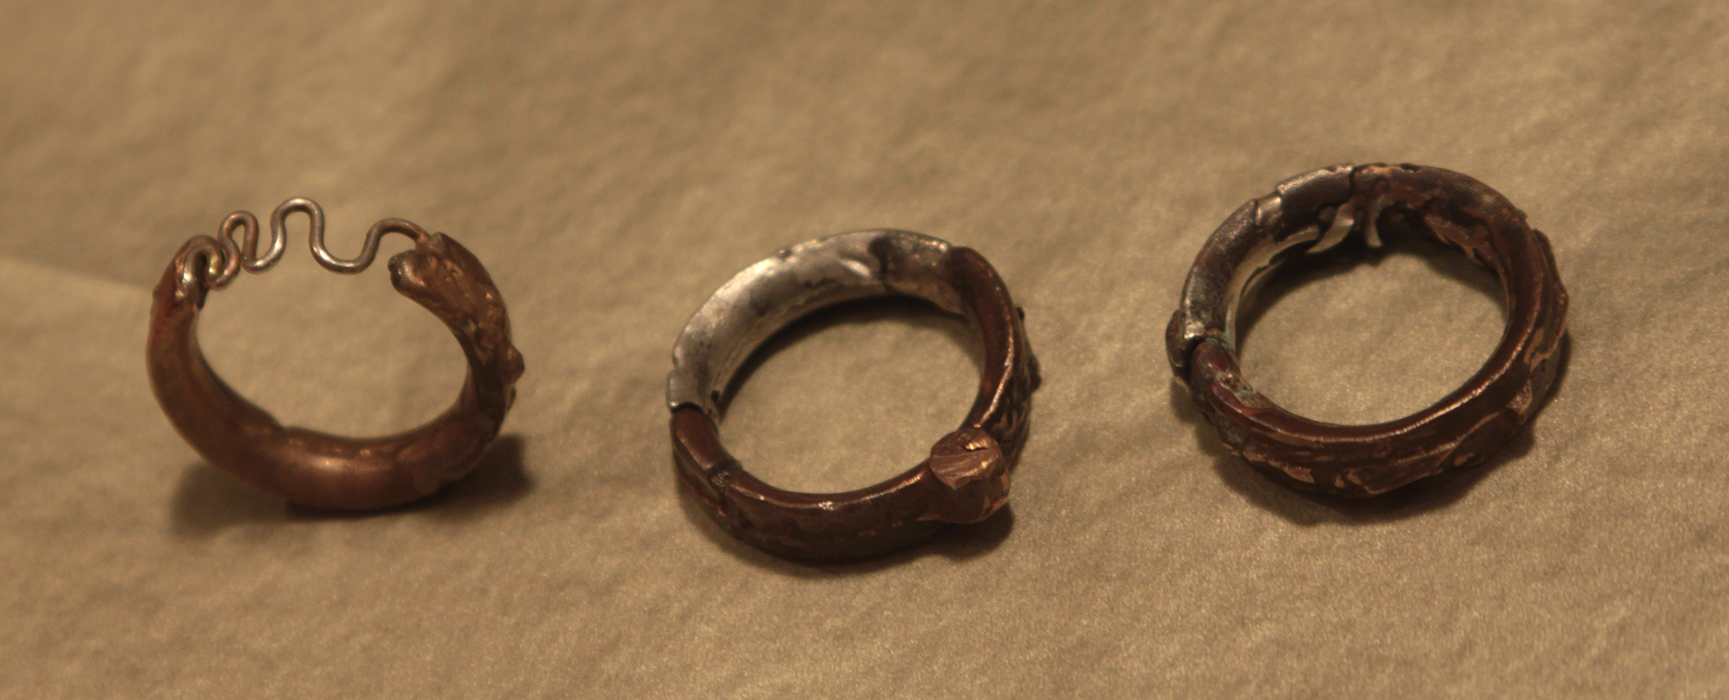 syann rings 1